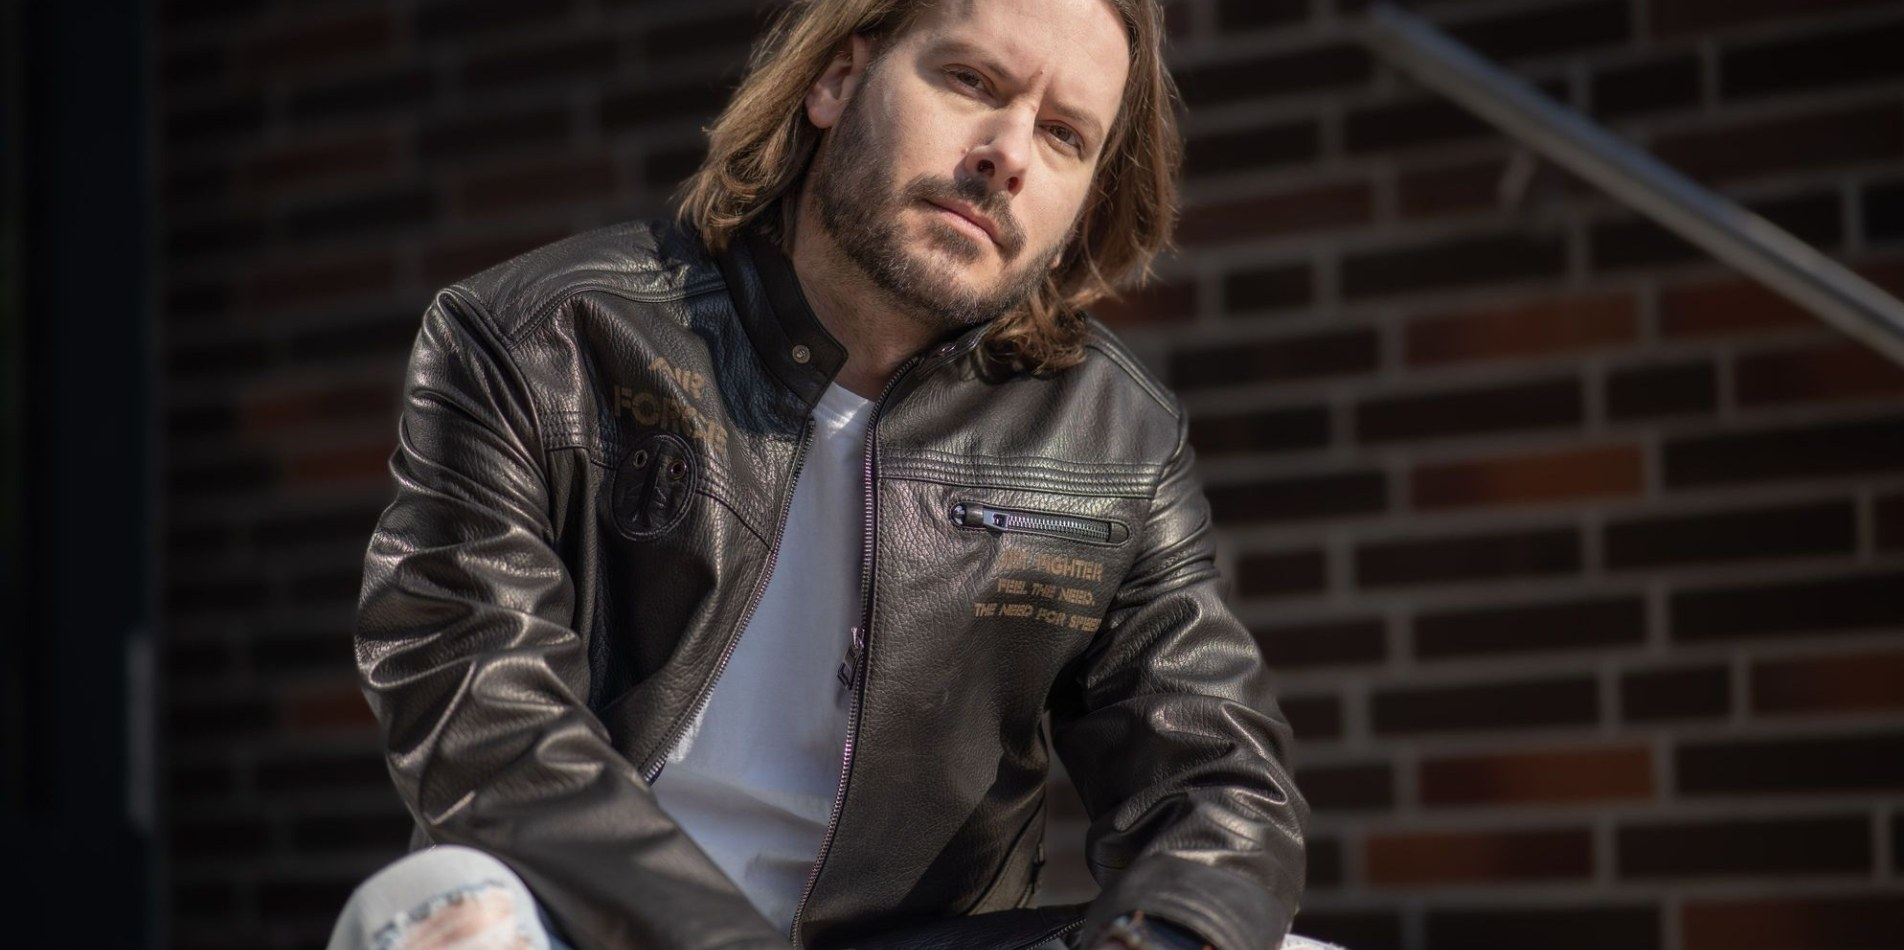 Nachhaltige Polar Polar LederHochwertige LederHochwertige Lederbekleidung Lederbekleidung Polar Nachhaltige Und Und Und LederHochwertige eW2YEDHI9b